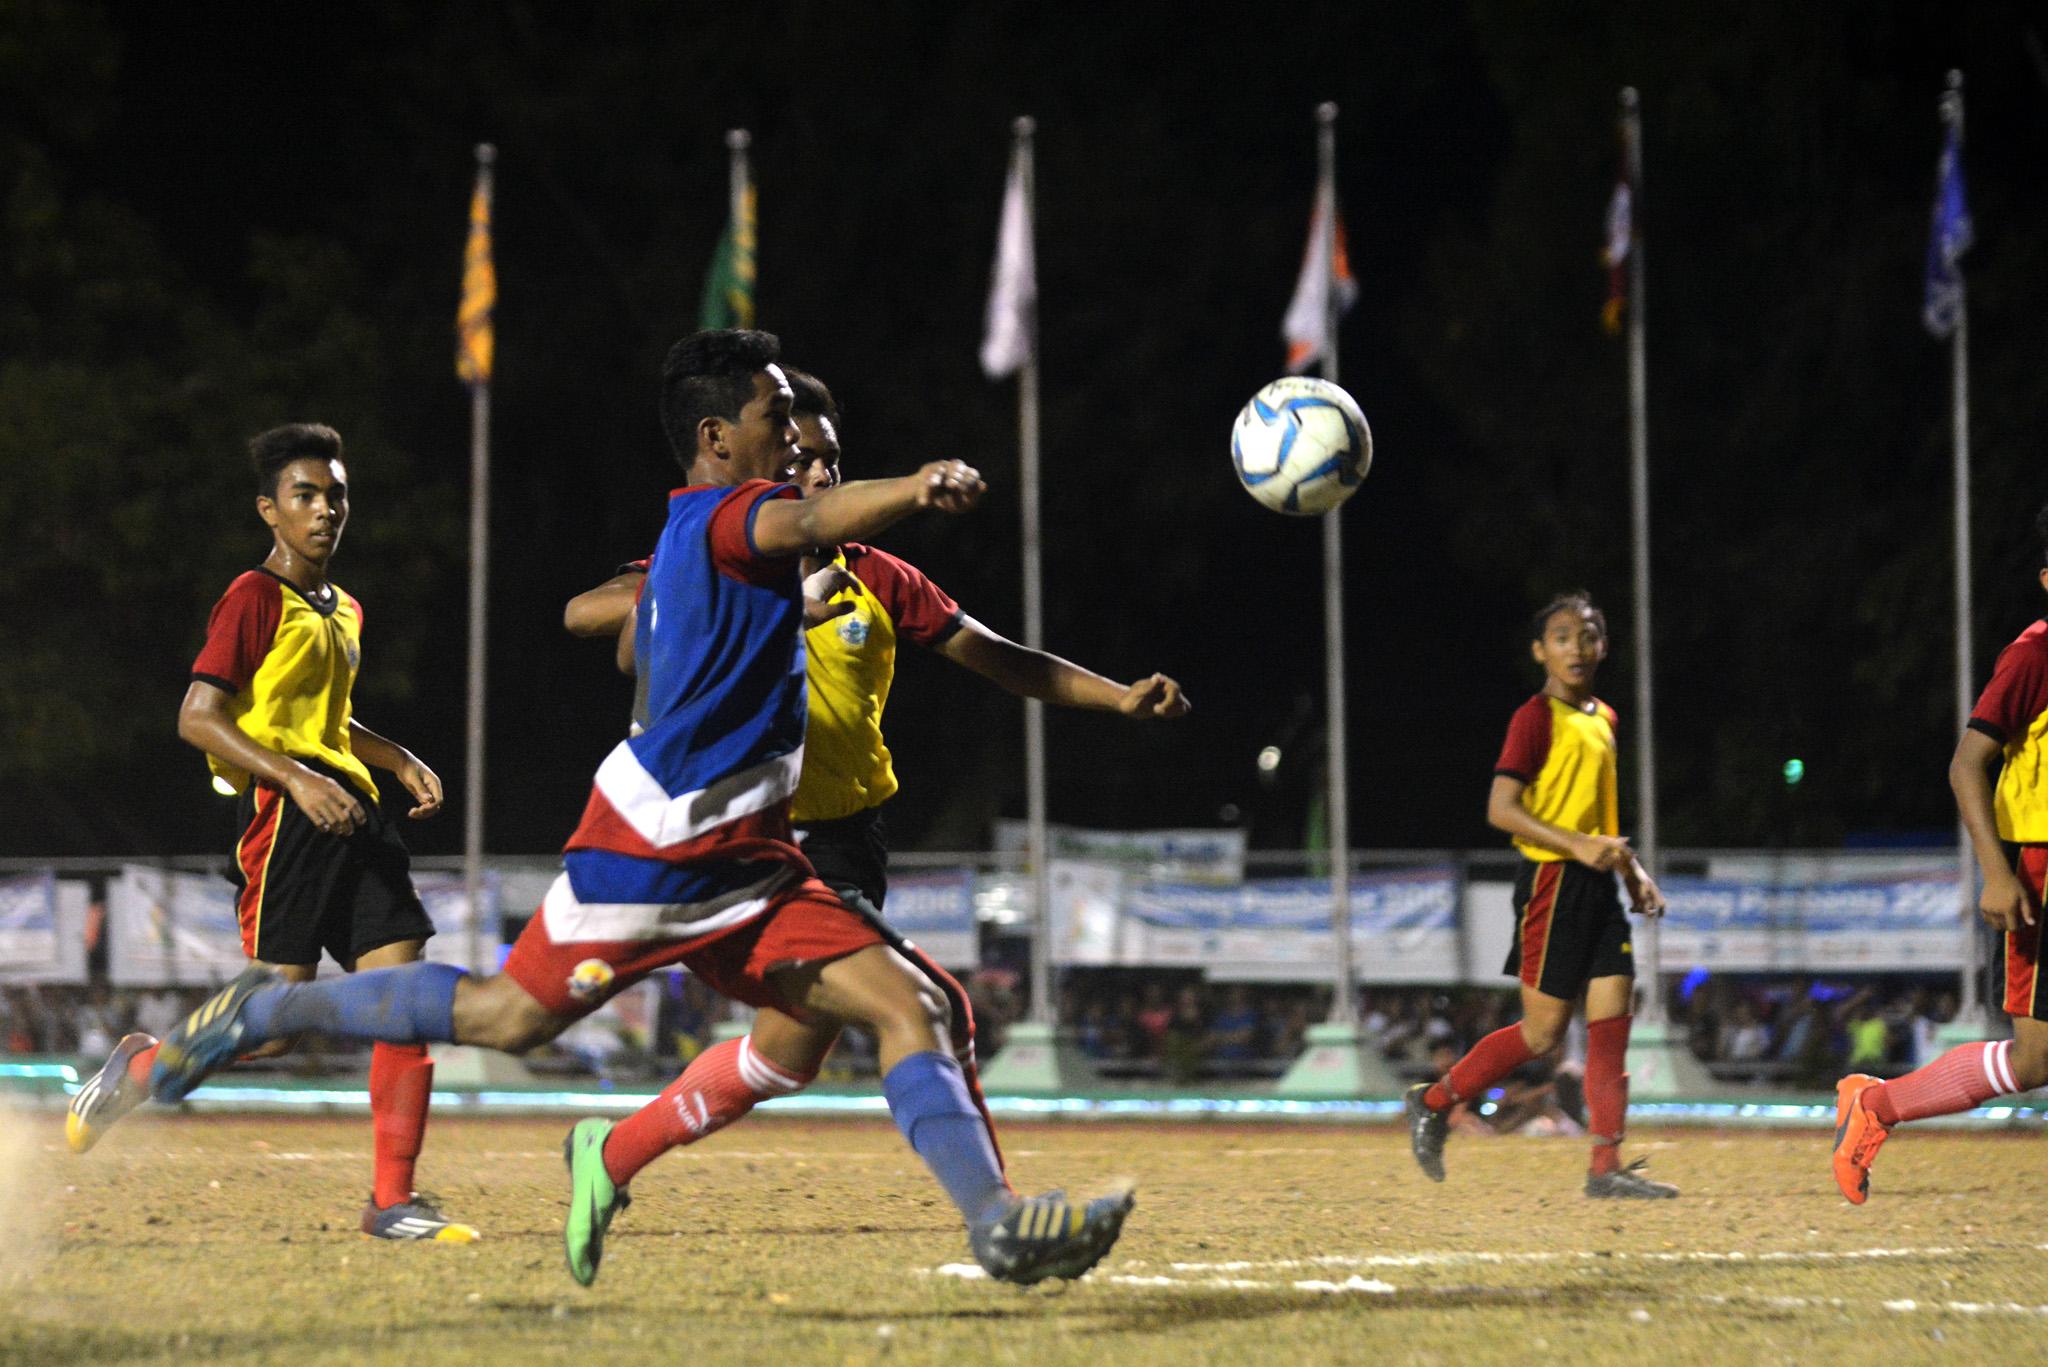 FOOTBALL DRAW. Bicol Region and Caraga battle to a 2-2 draw. Photo by Roy Secretario/Rappler